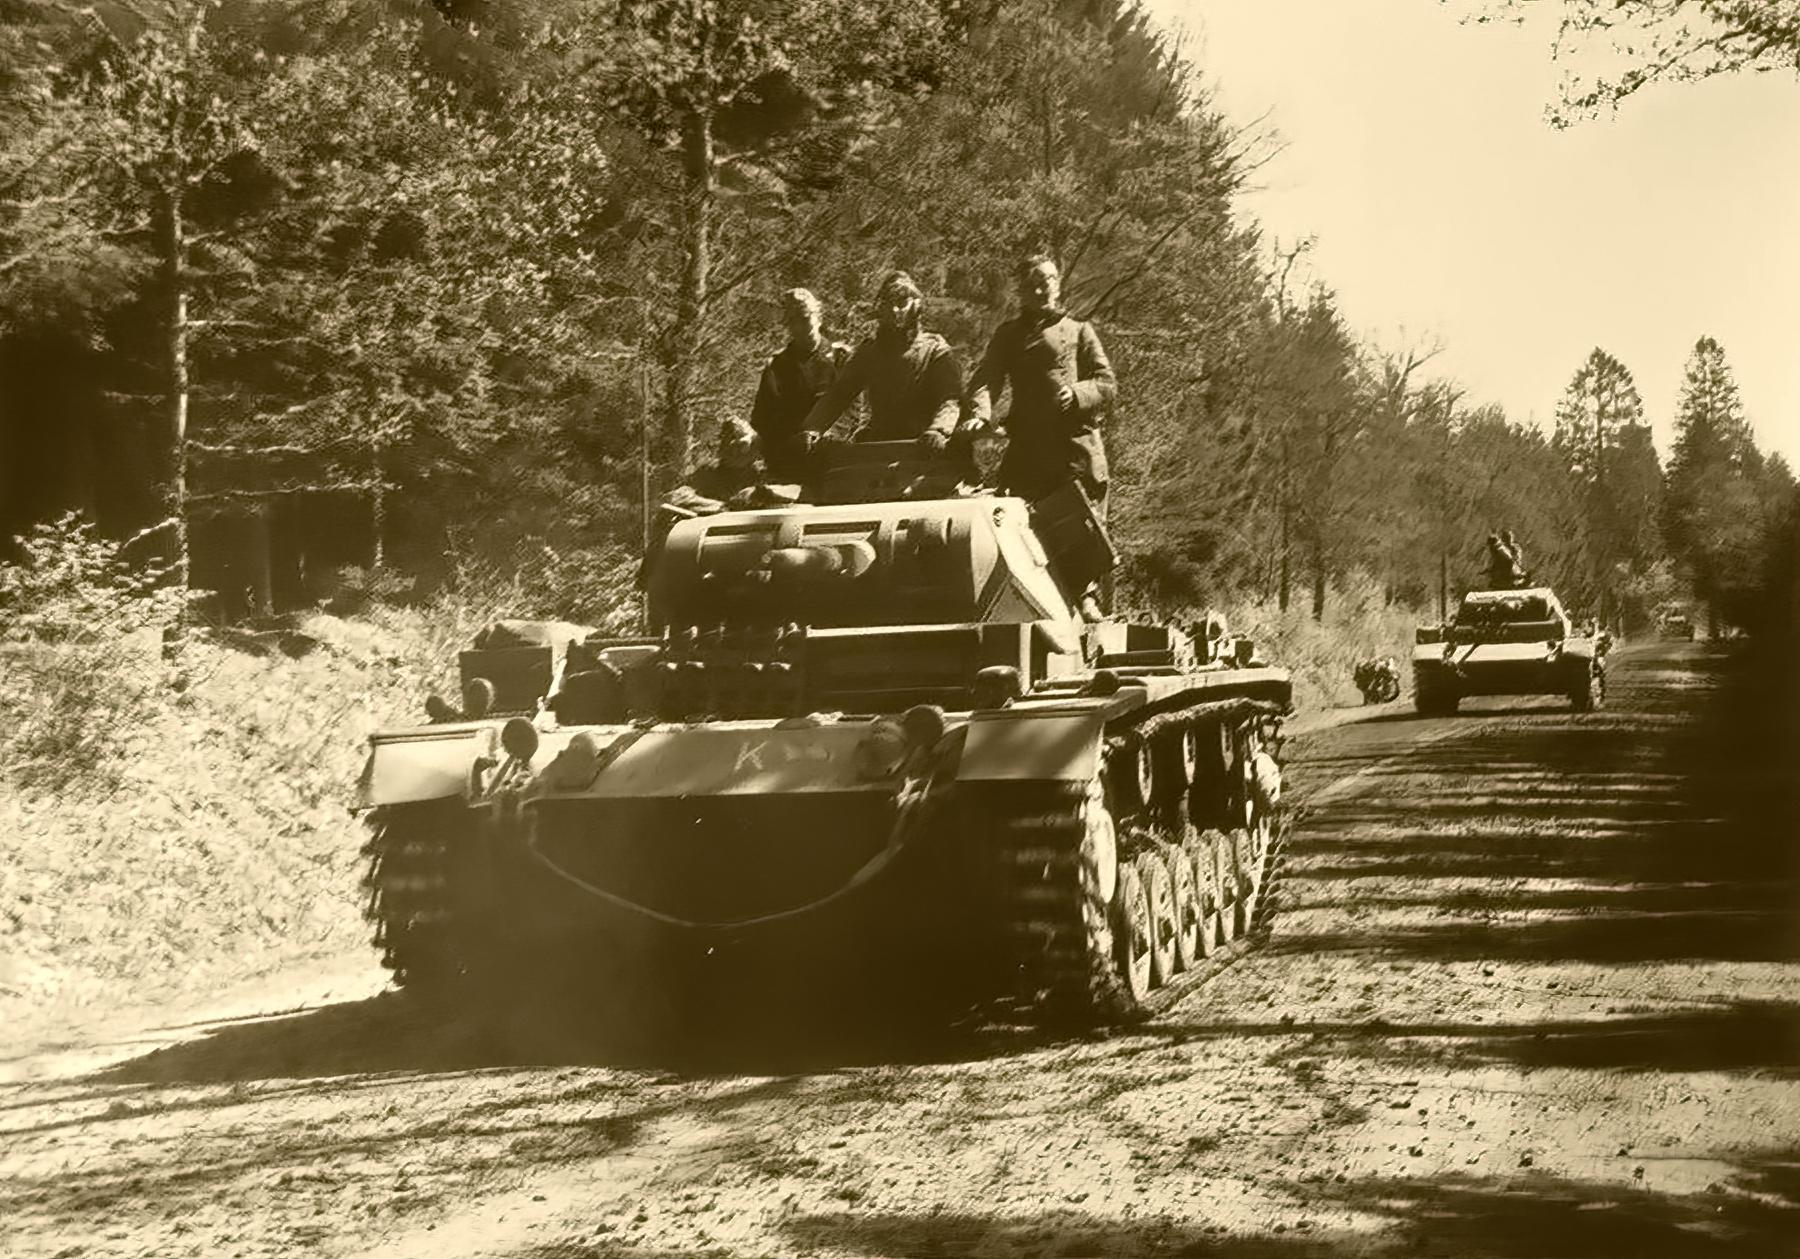 Wehrmacht tank column advance through Belgium 1940 ebay 02